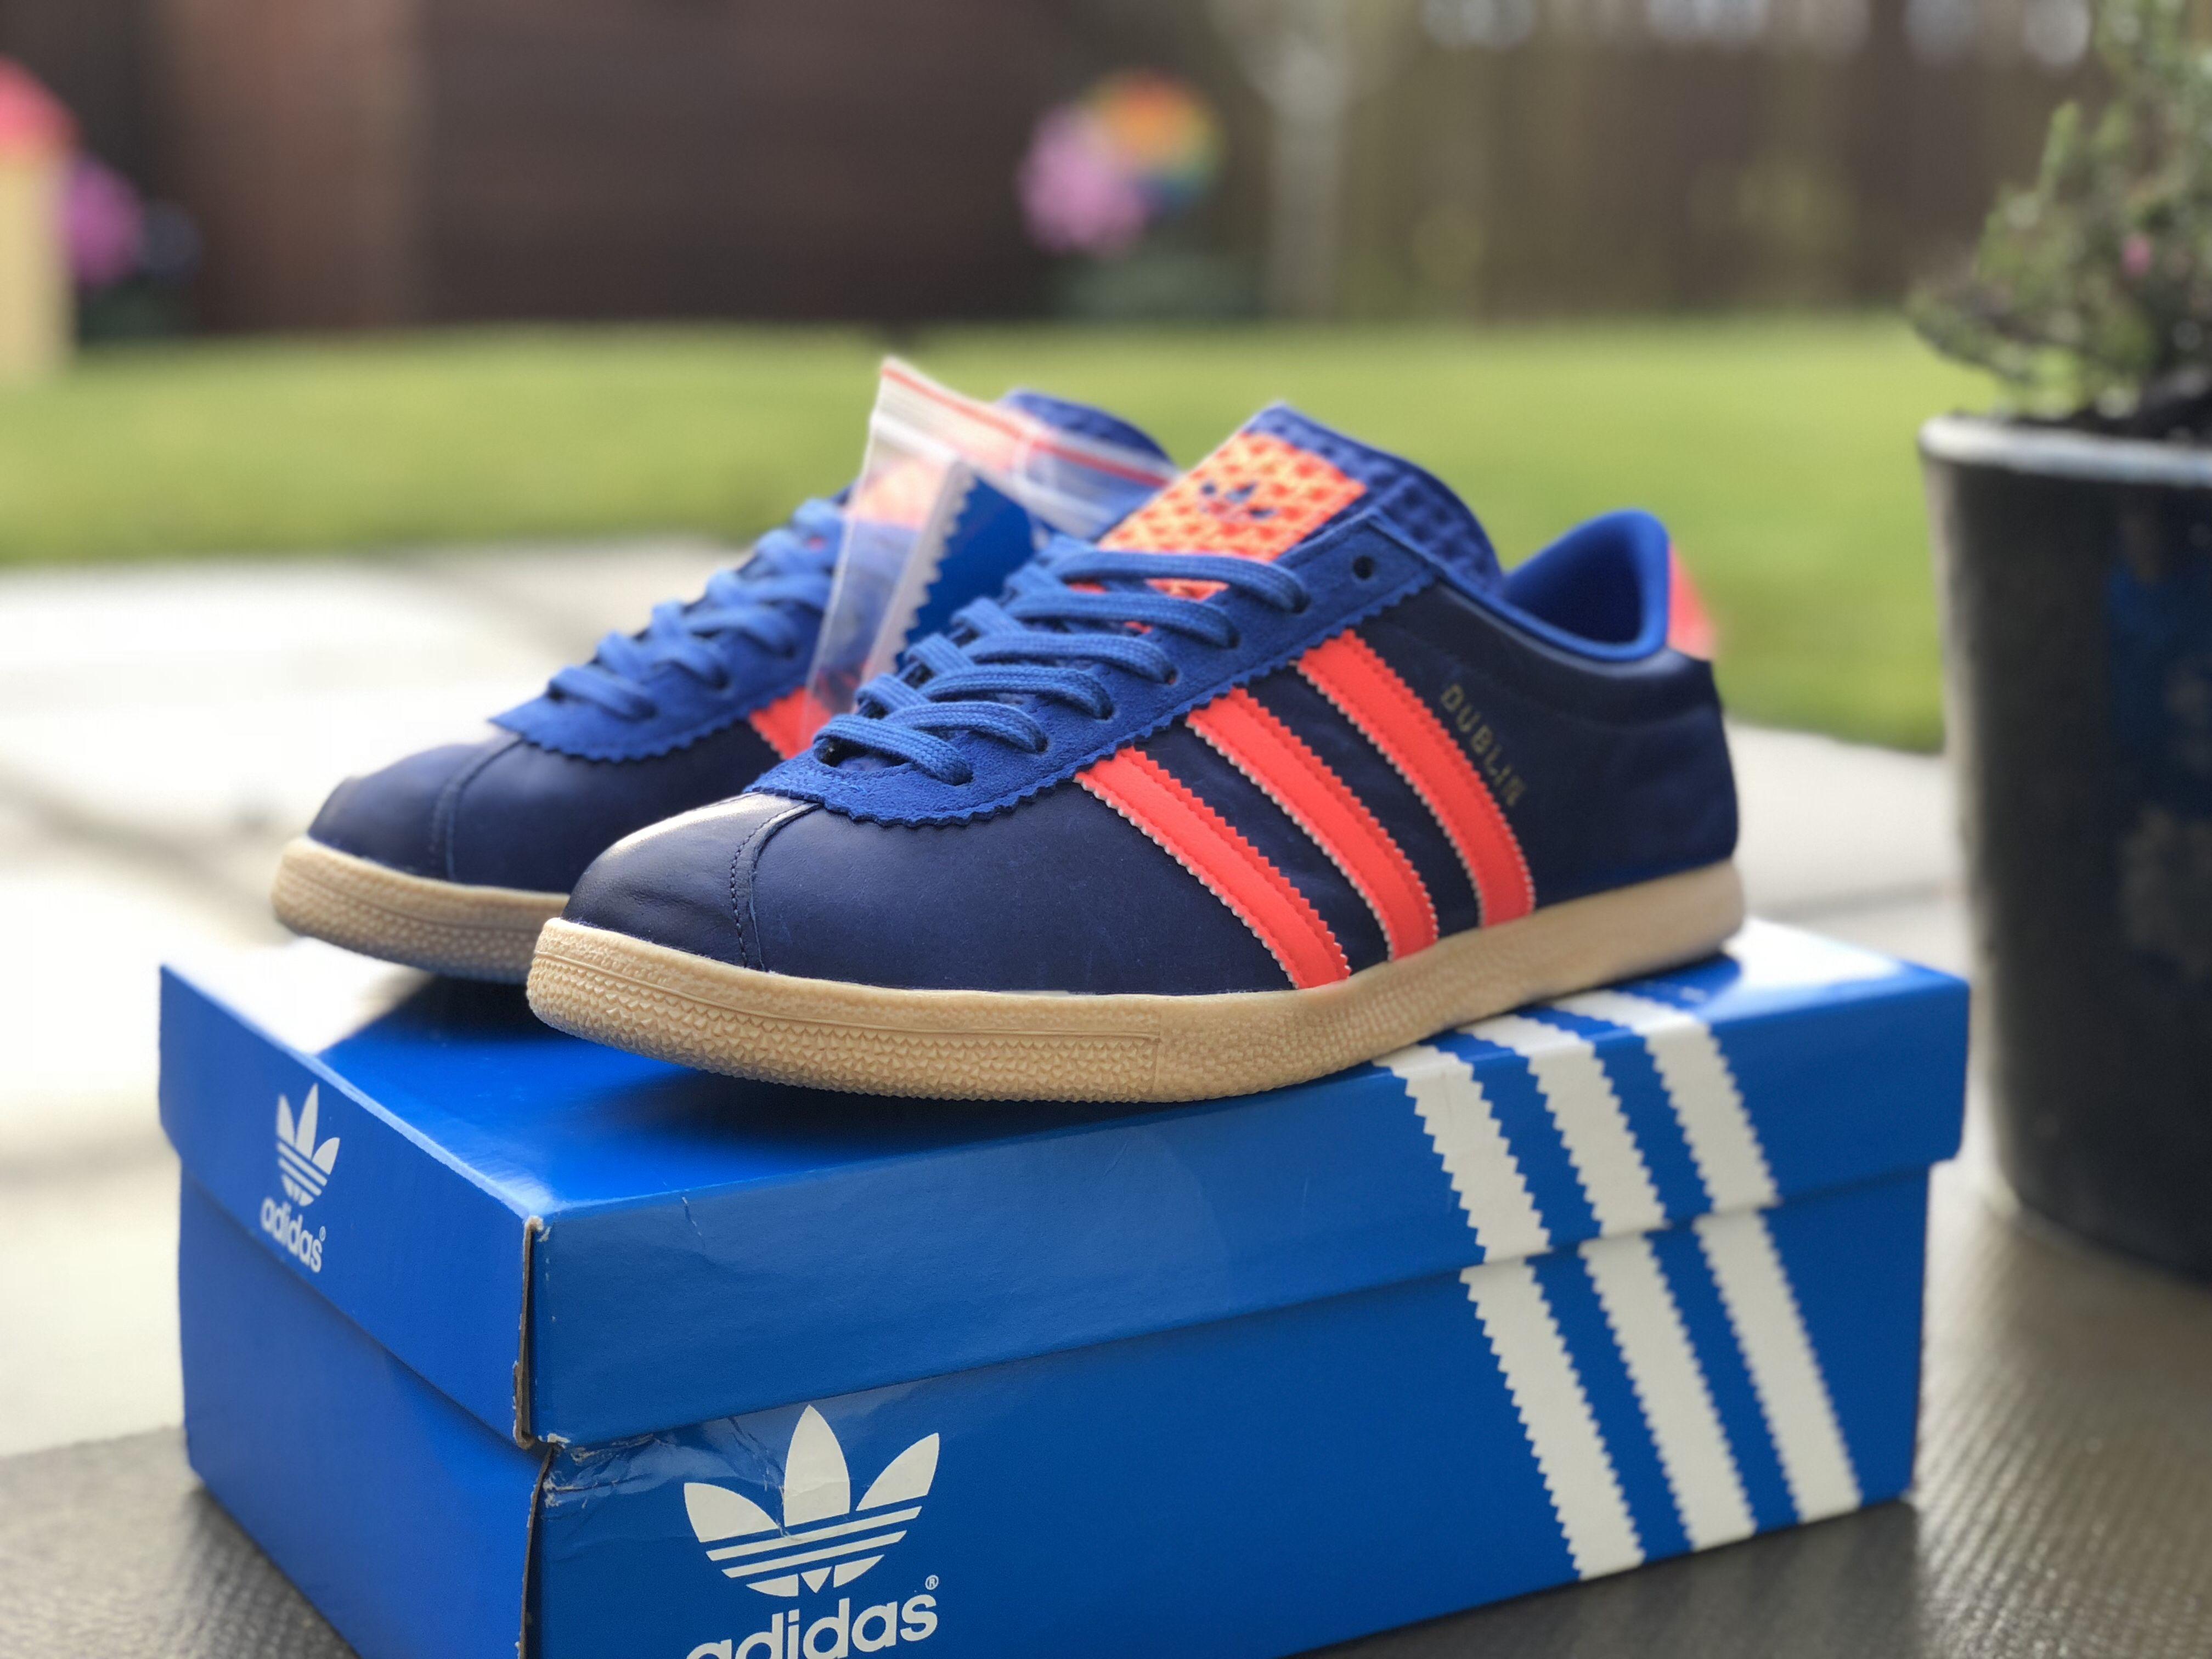 Productos lácteos extraño Residencia  Adidas Dublin Size? 10 Year Anniversary | Adidas, Adidas trainers, Adidas  samba